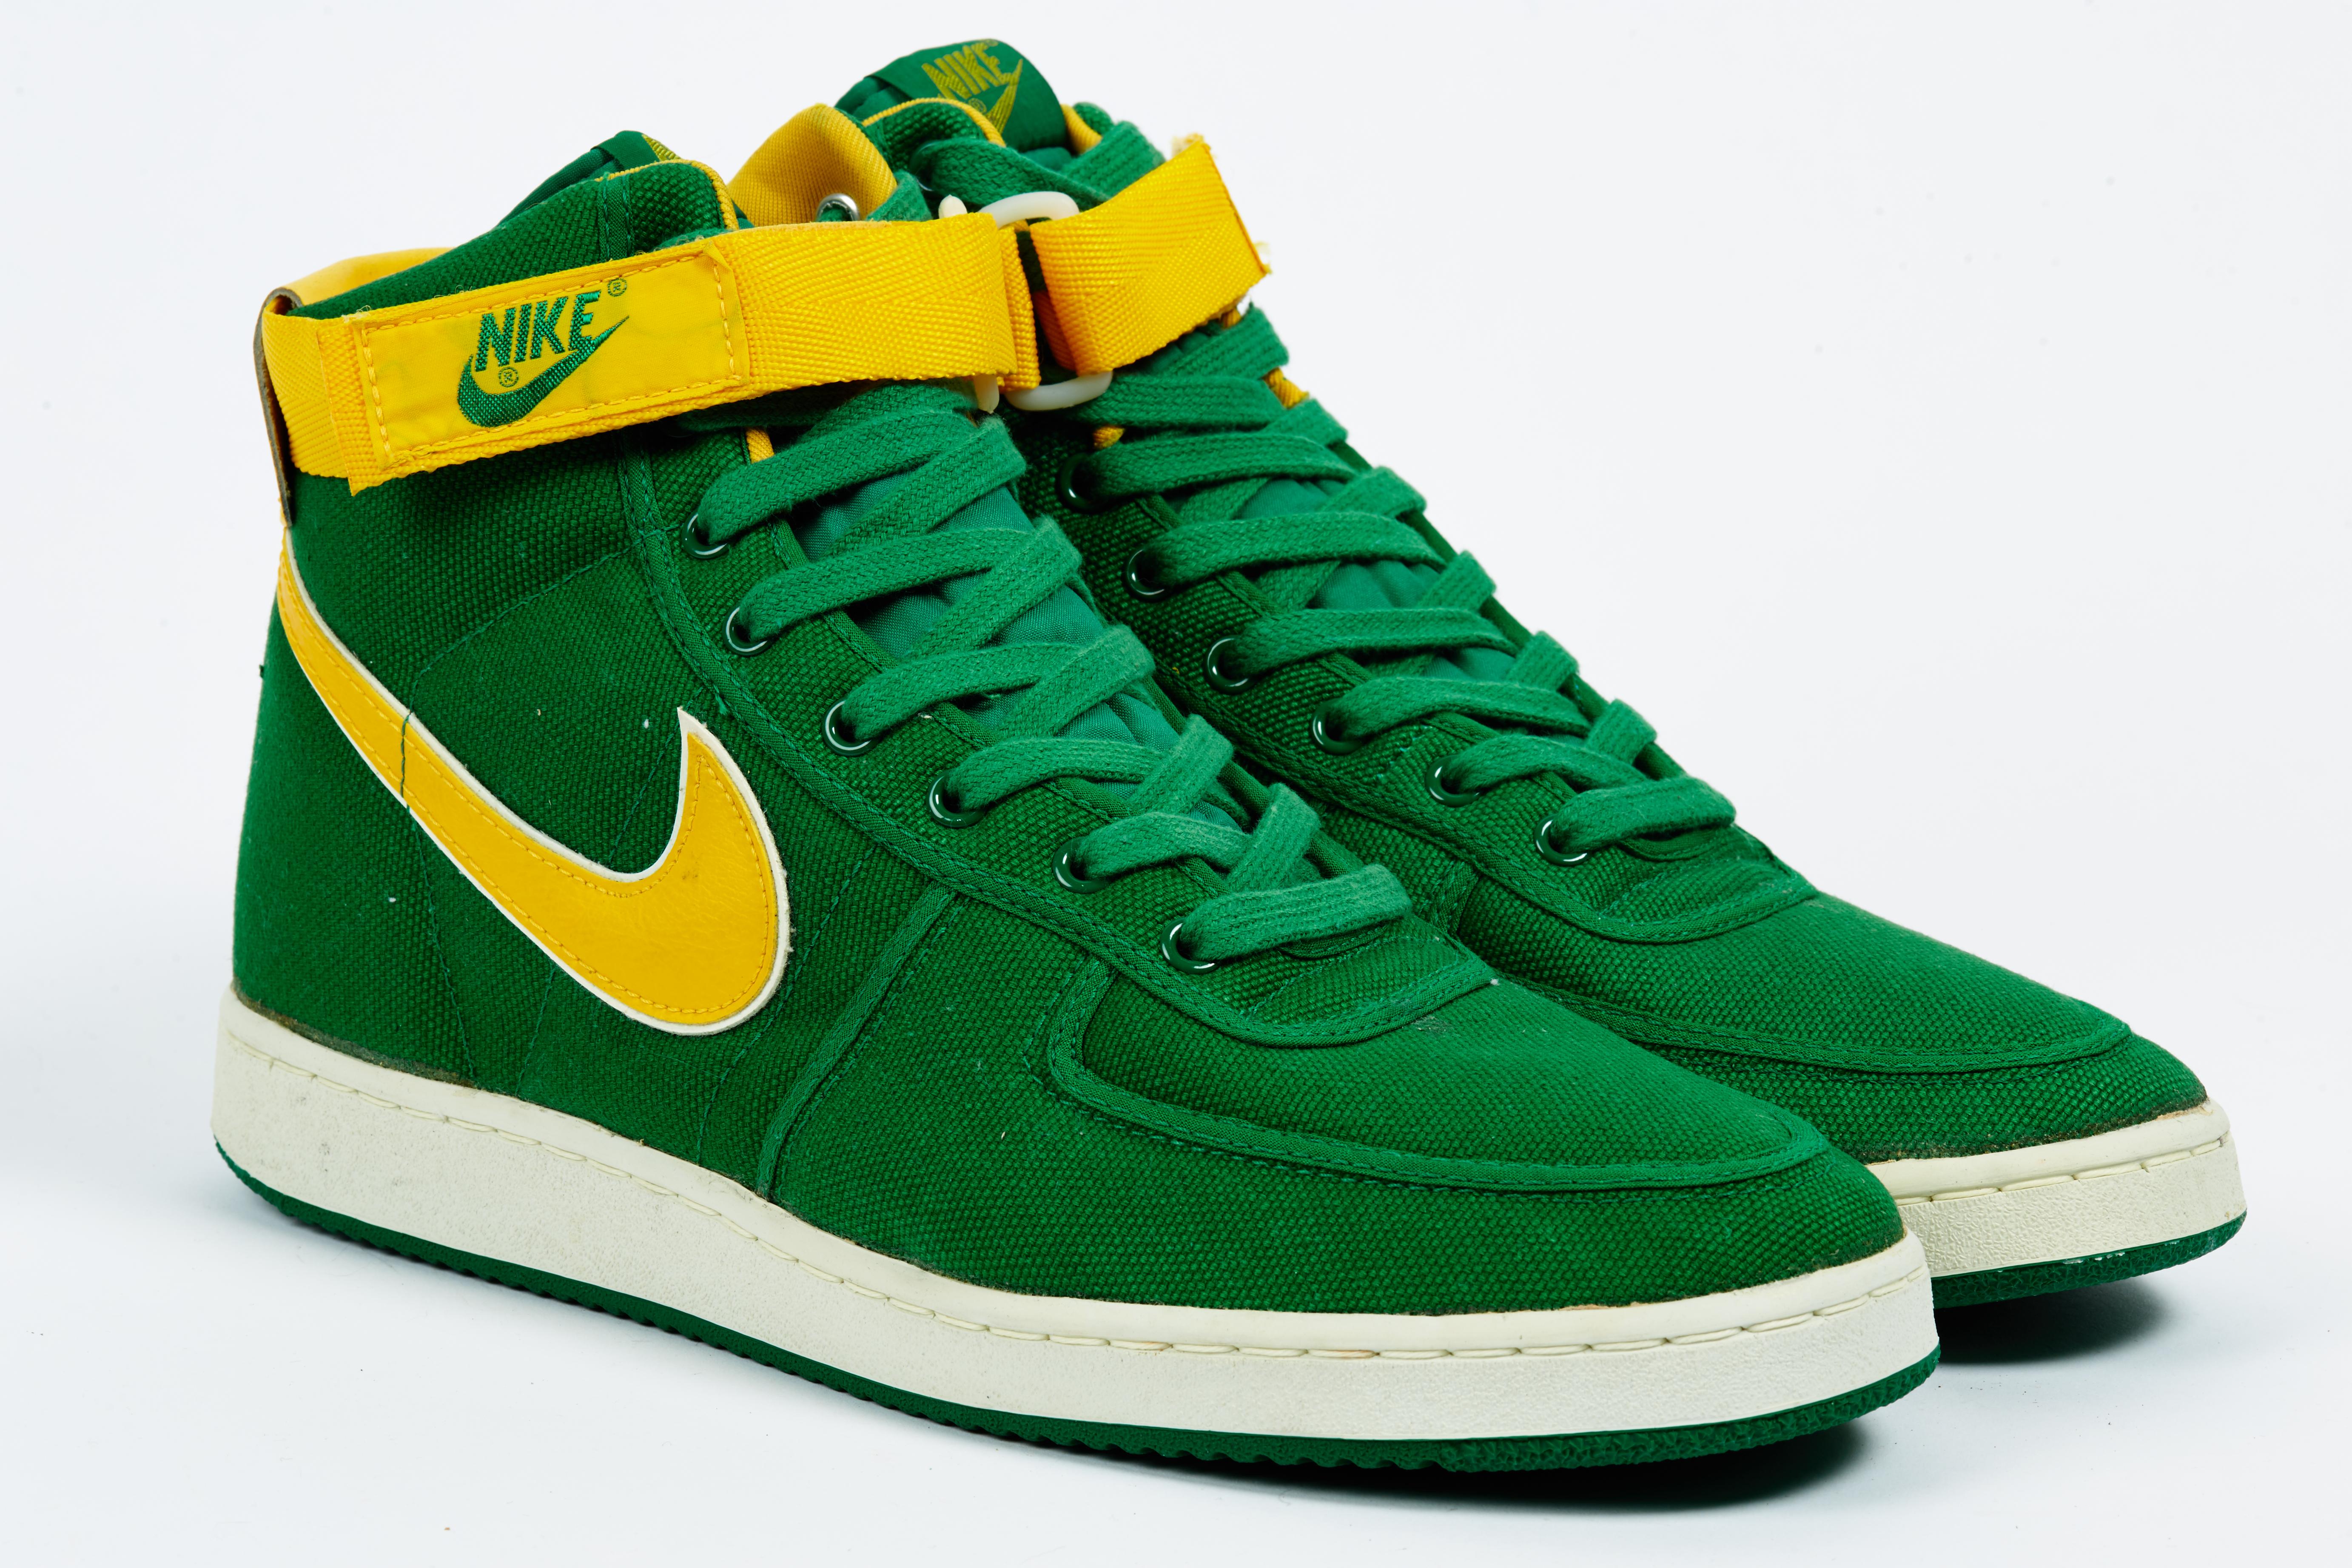 Vintage 1984 Nike Vandal - Shoes Your